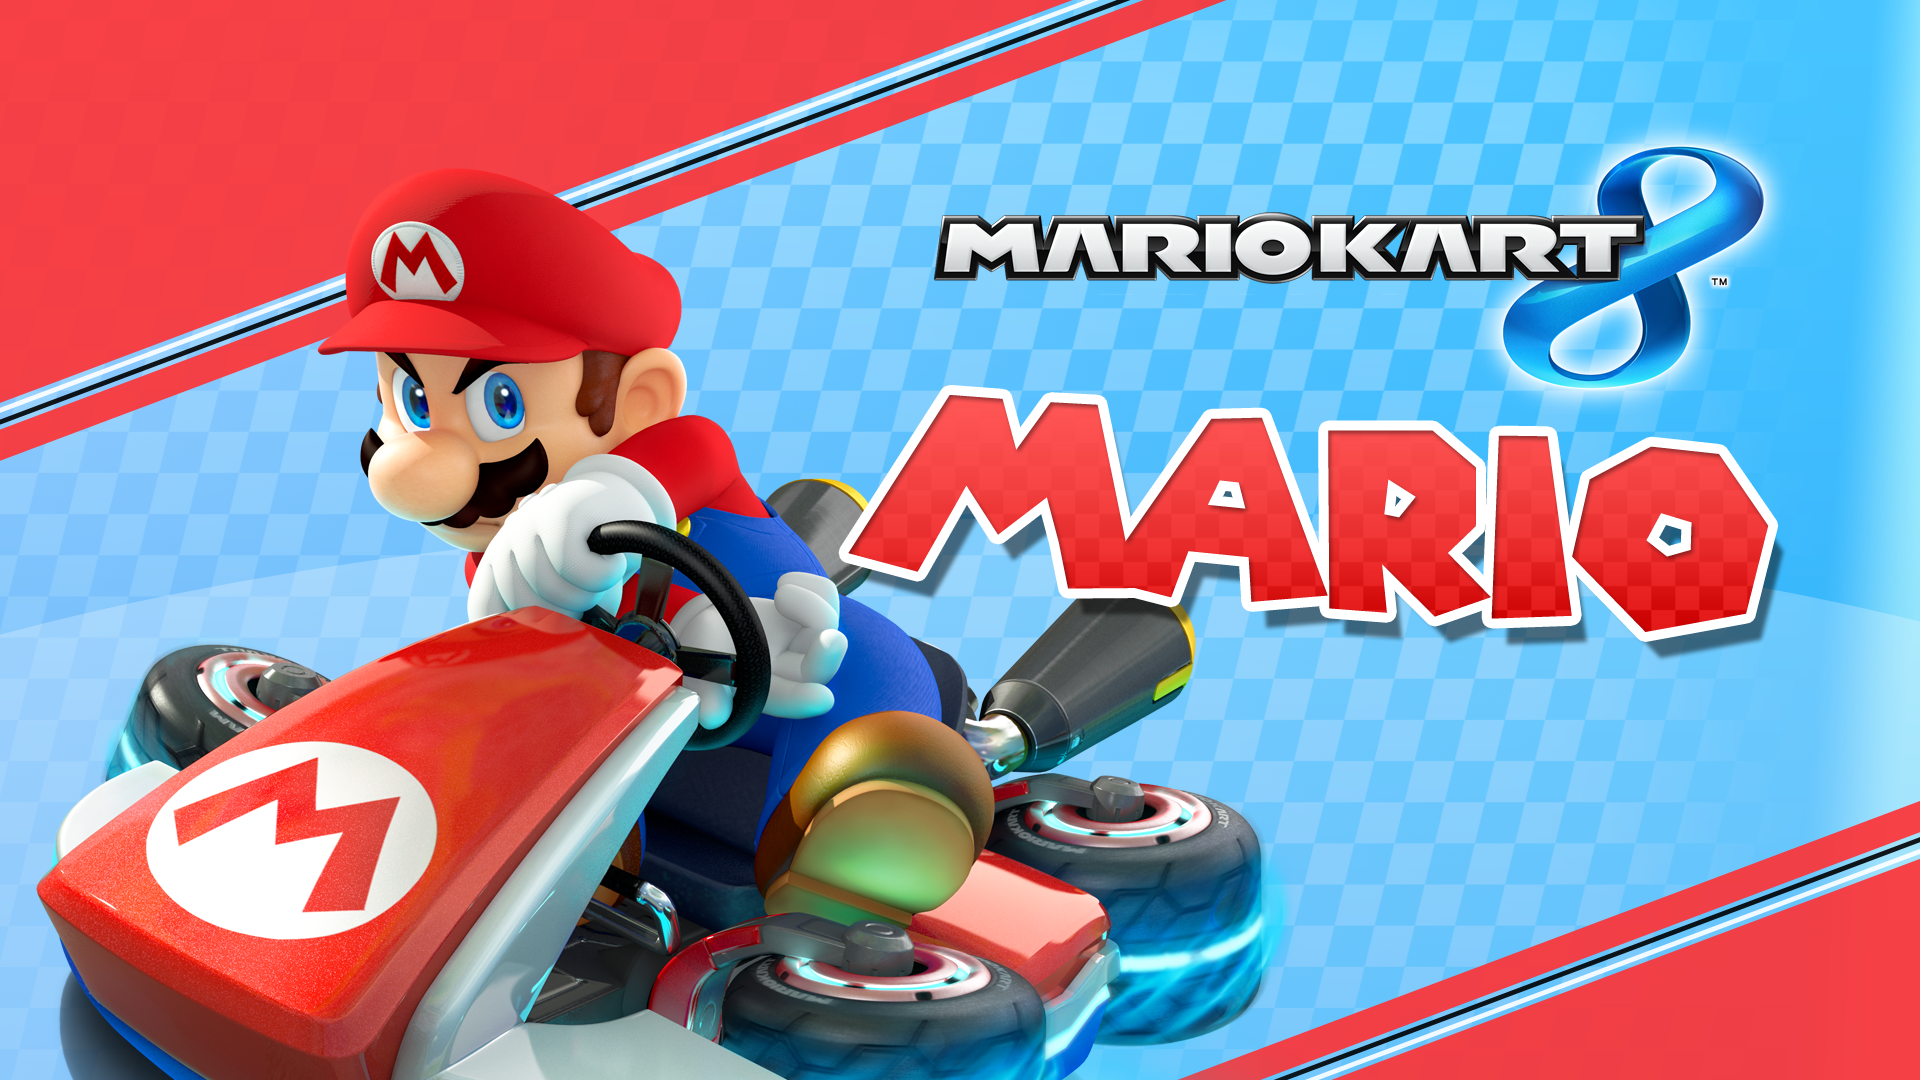 Mario Kart 8 Wallpaper: 1920 X 1080 Mario Kart 8 Wallpaper By MaxiGamer On